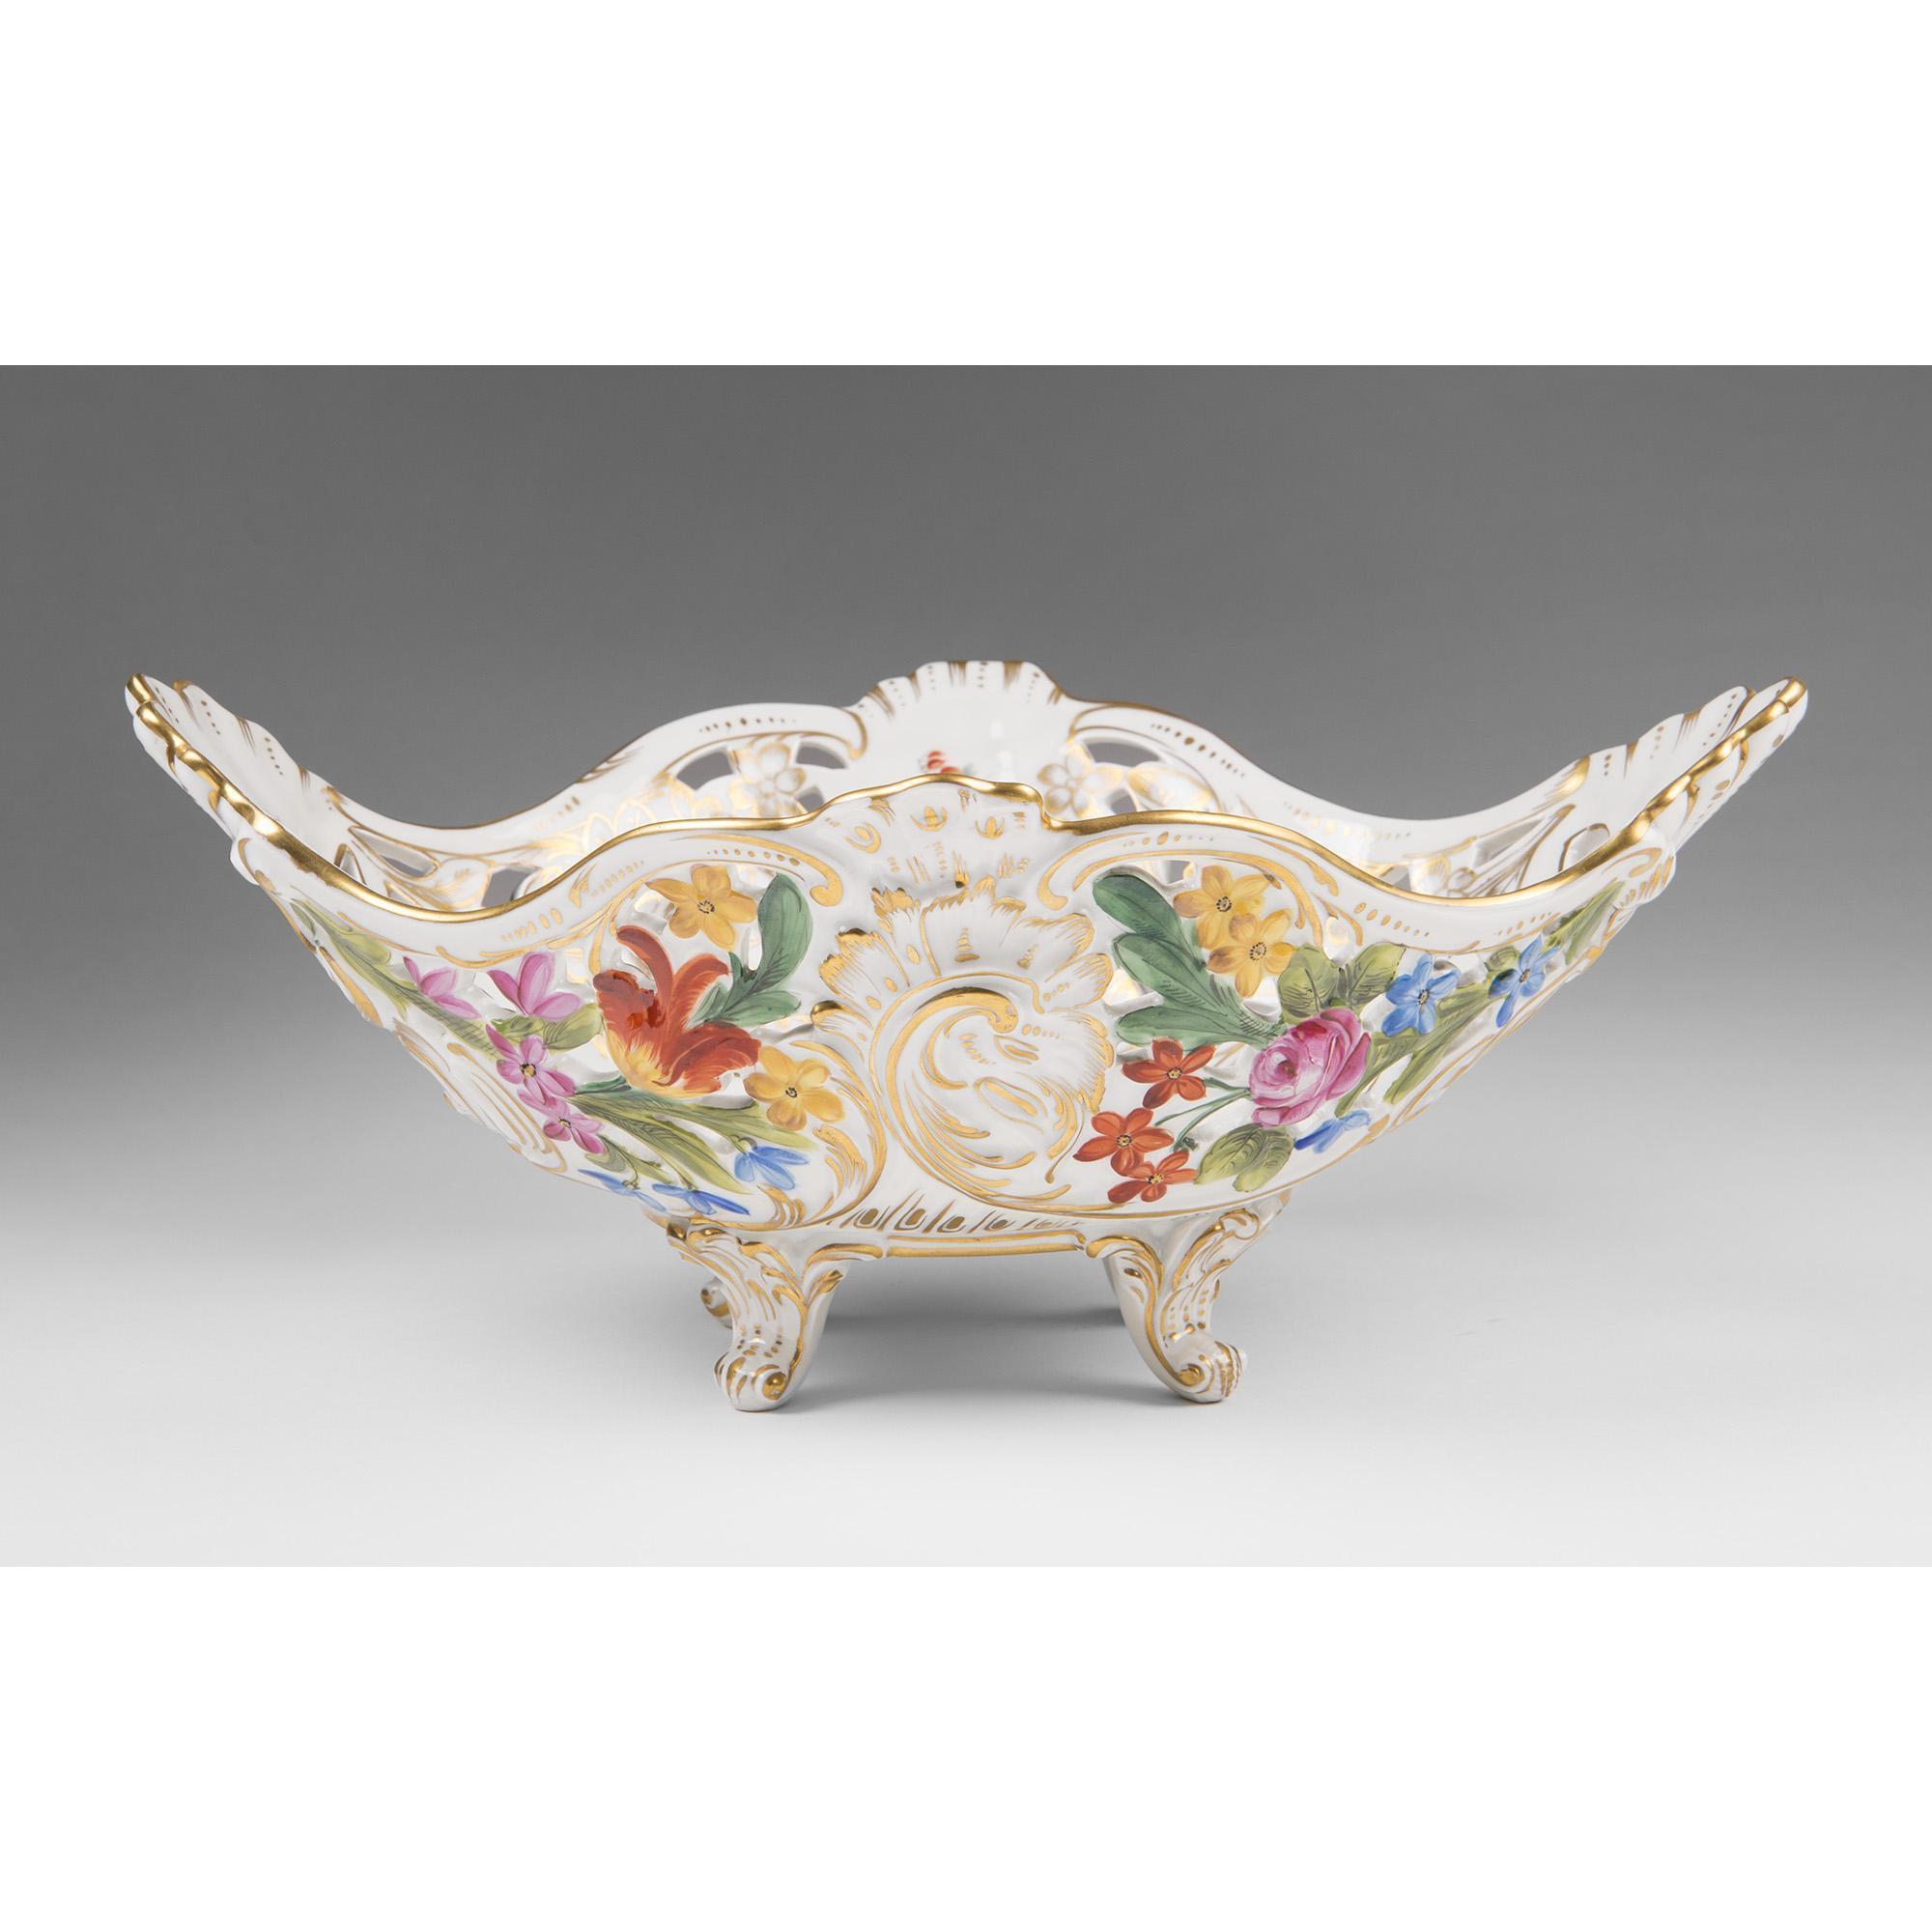 Carl Thieme Dresden Porcelain Reticulated Center Bowl